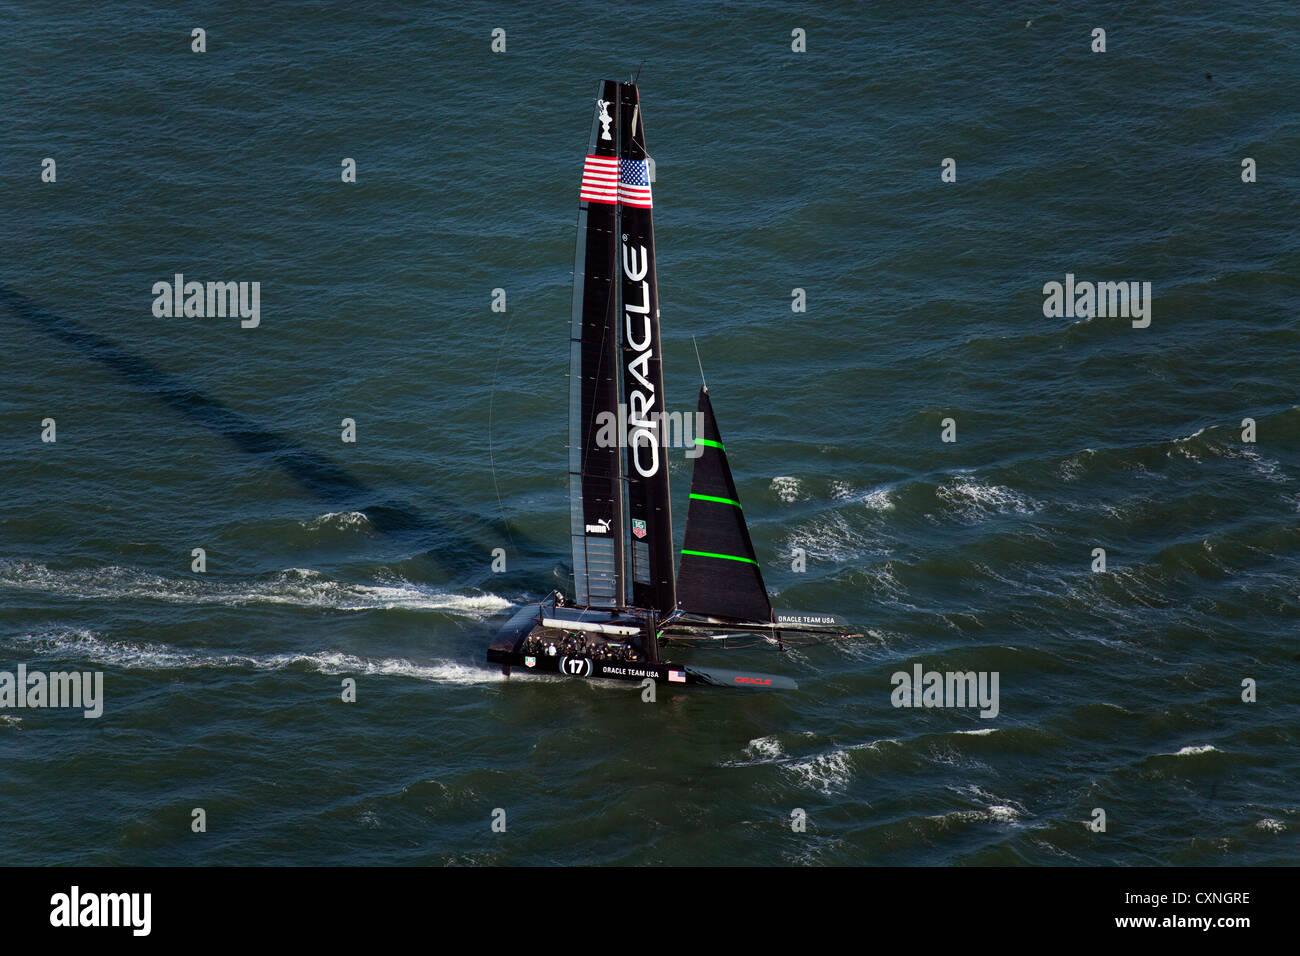 aerial photograph Oracle Racing America's Cup San Francisco bay California - Stock Image